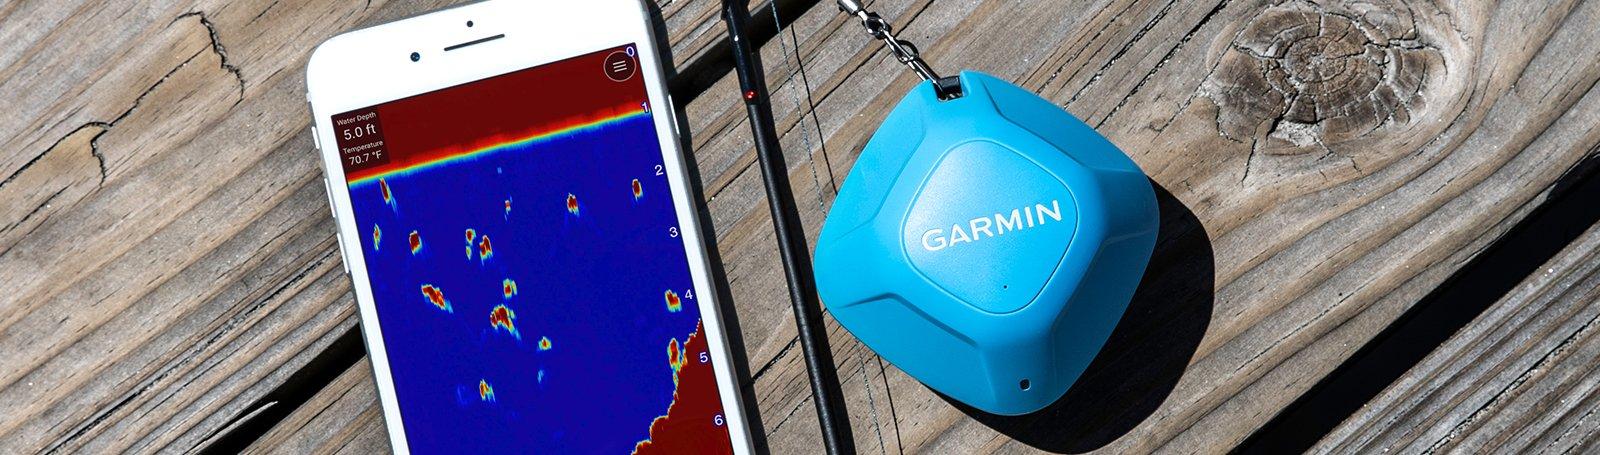 Ekkolodd GARMIN STRIKER Cast GPS Trådløst EkkoloddGPS for Smarttelefon 0100224602